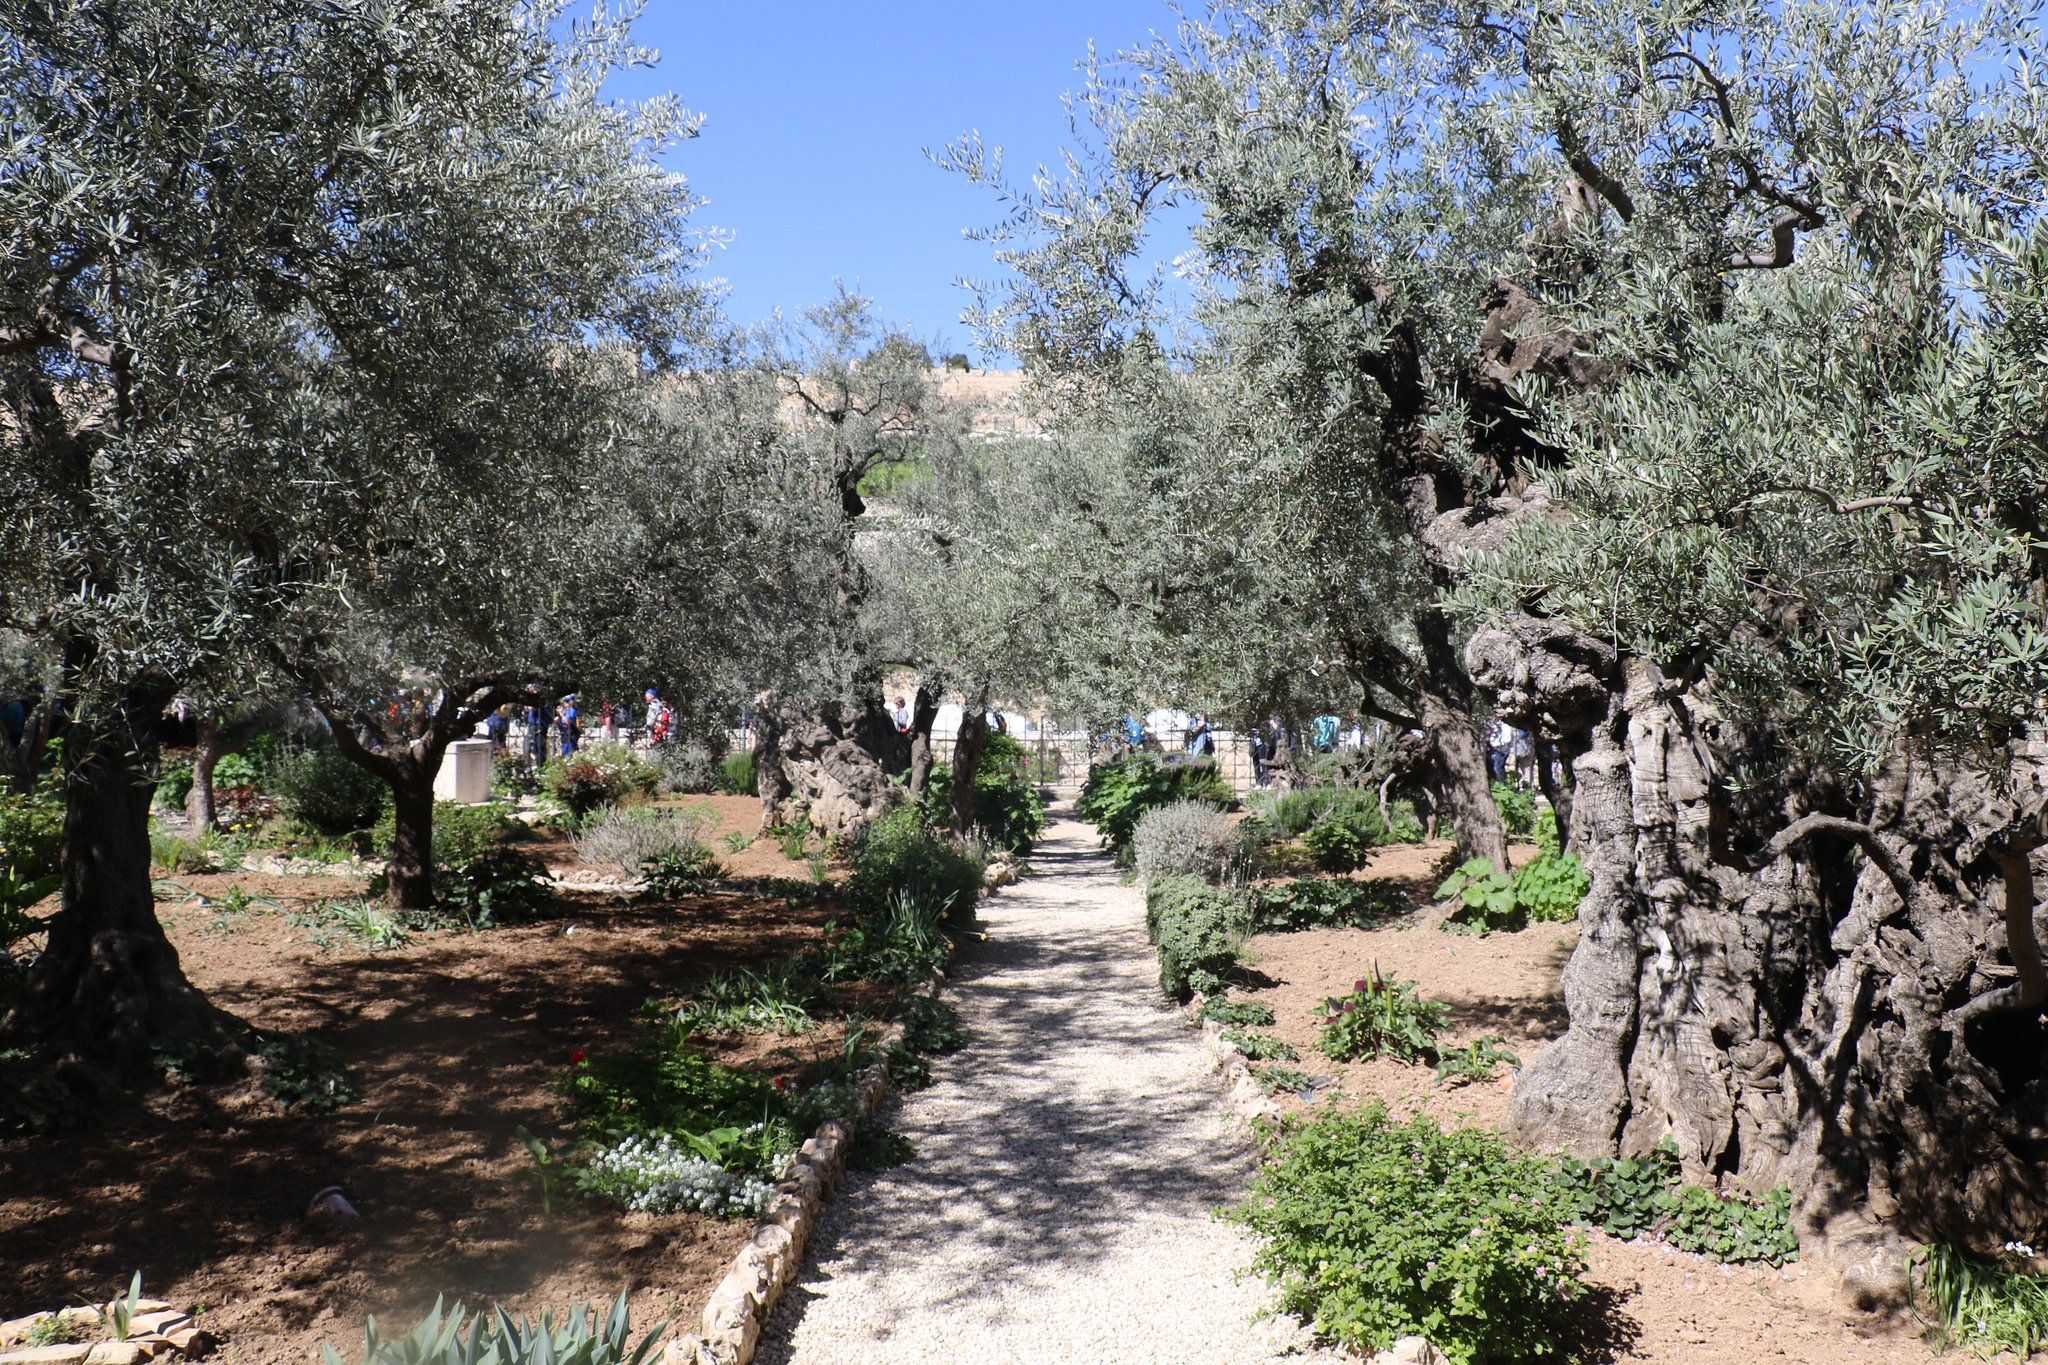 Garden of Gethsemane Garden of gethsemane, Garden, Olive